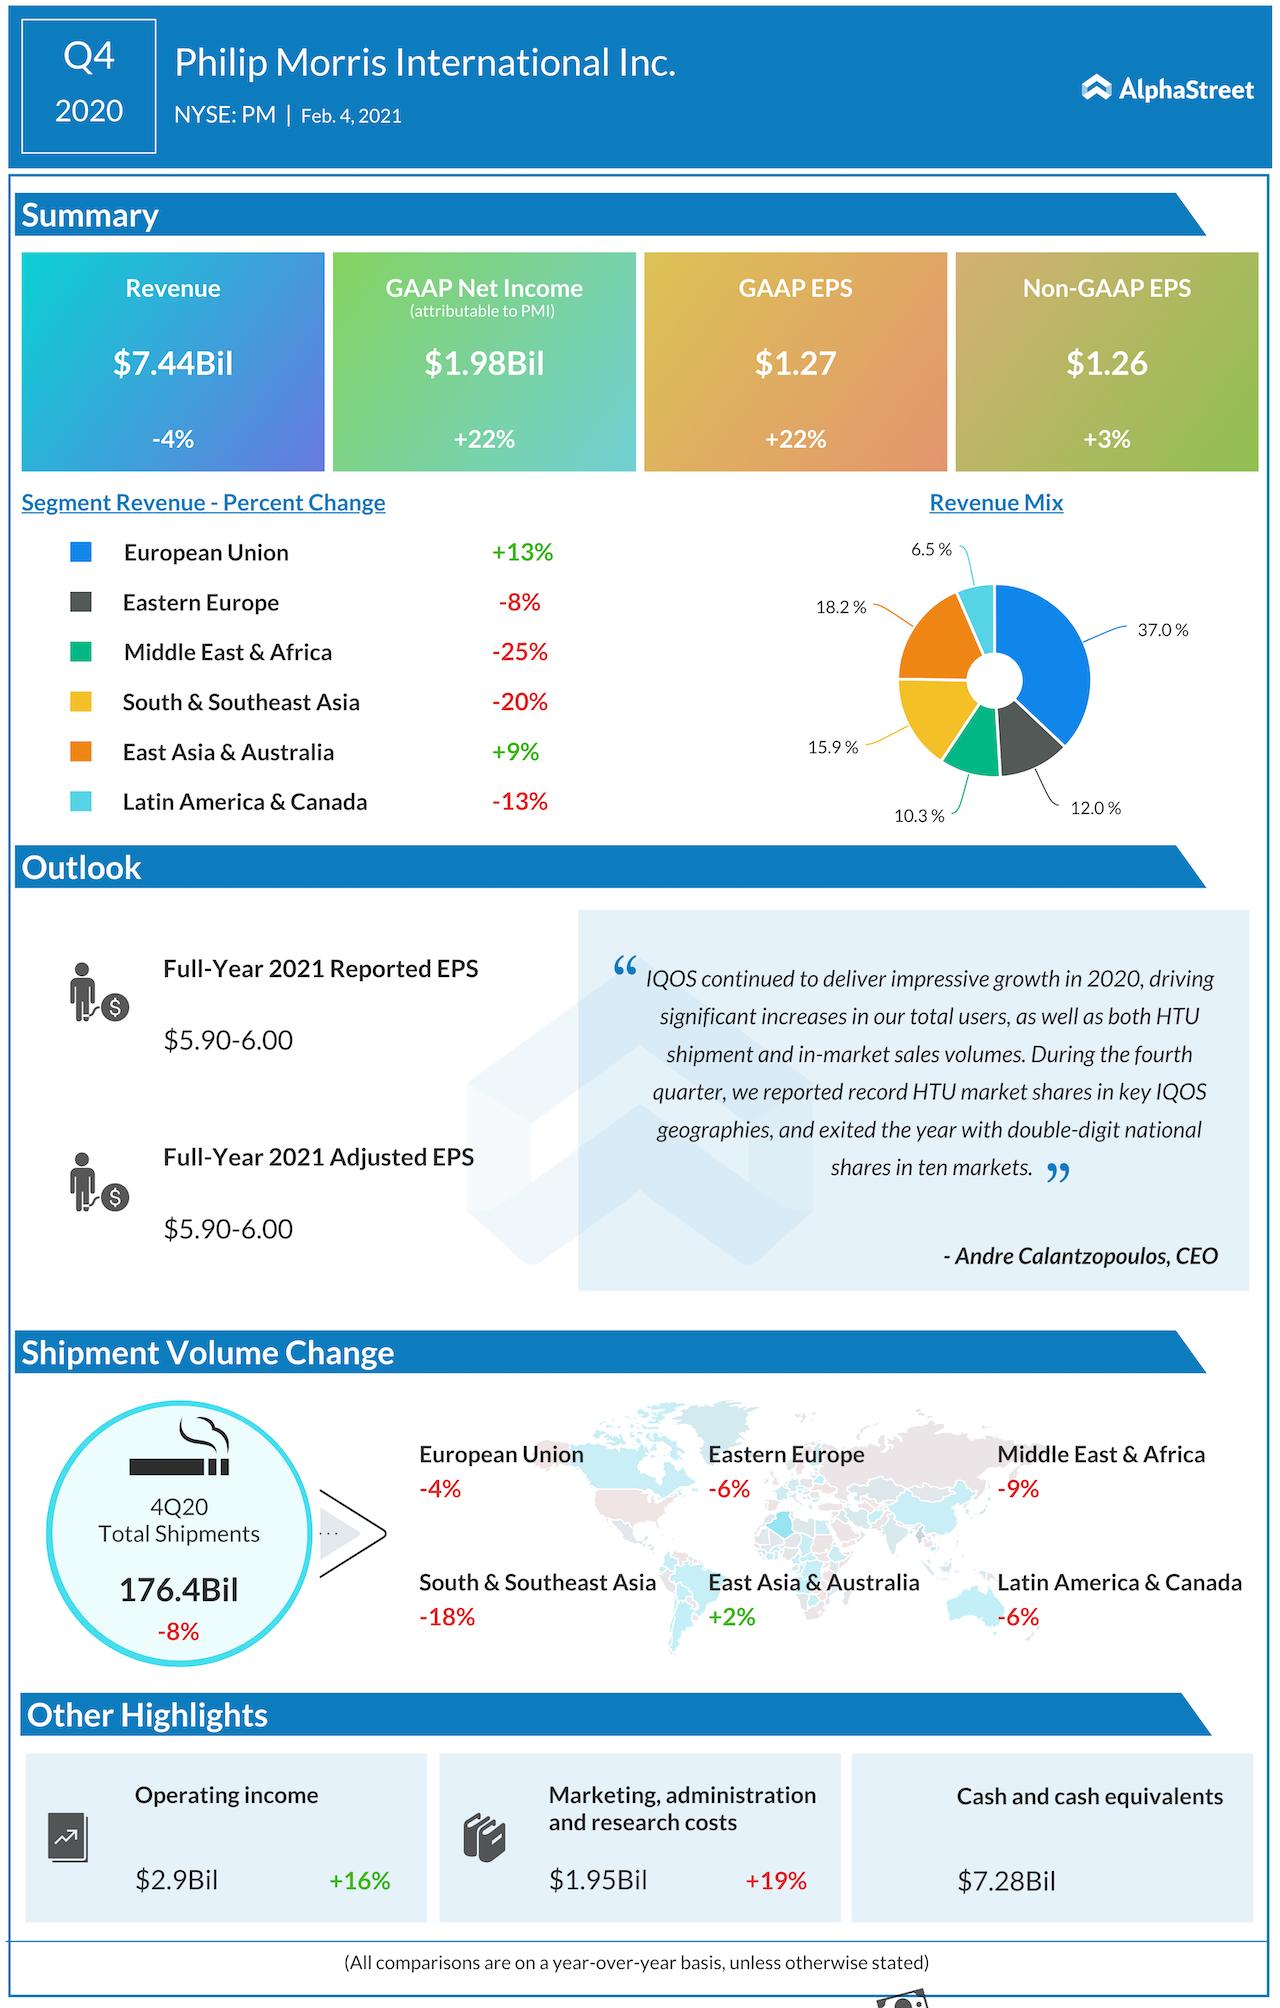 Philip Morris International Q4 2020 earnings